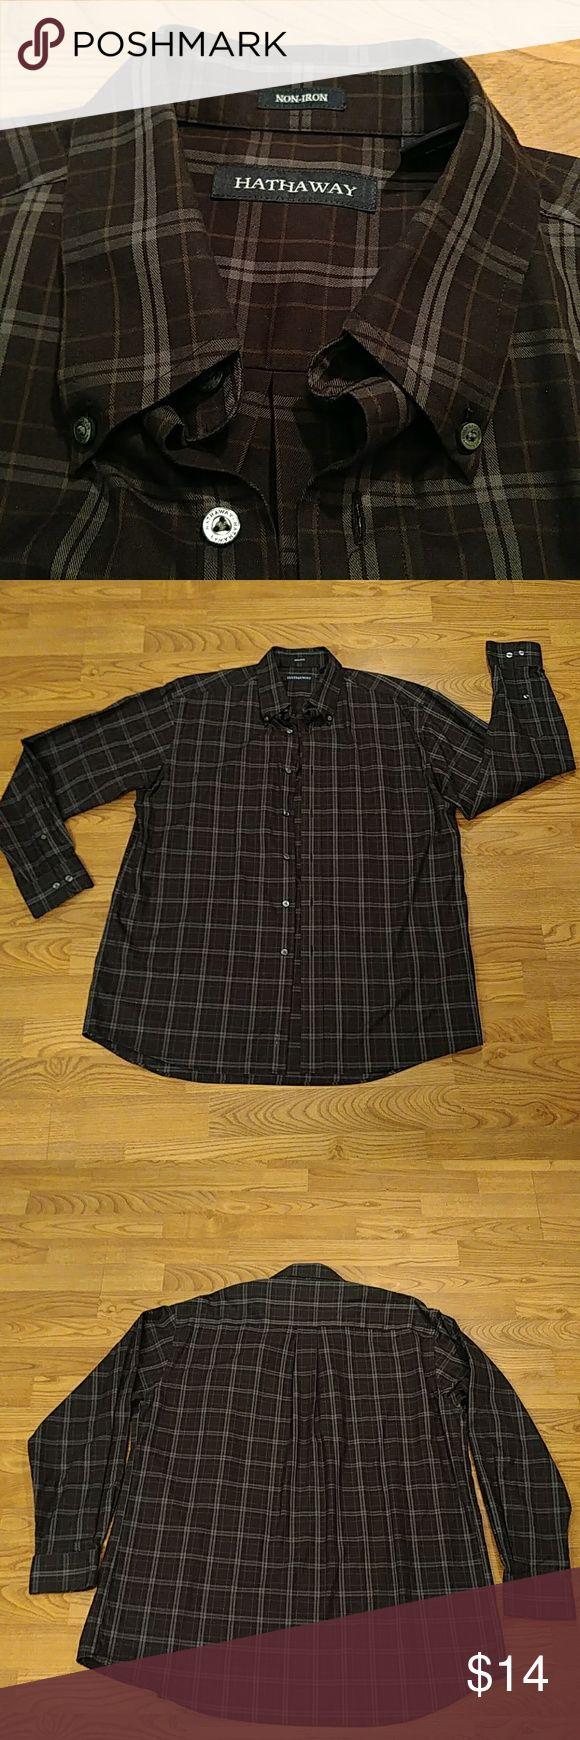 Hathaway men's dress shirt 100%cotton non iron Hathaway 100%cotton non iron dress shirt size L, black and gray stripe with light tan pinstripe hathaway Shirts